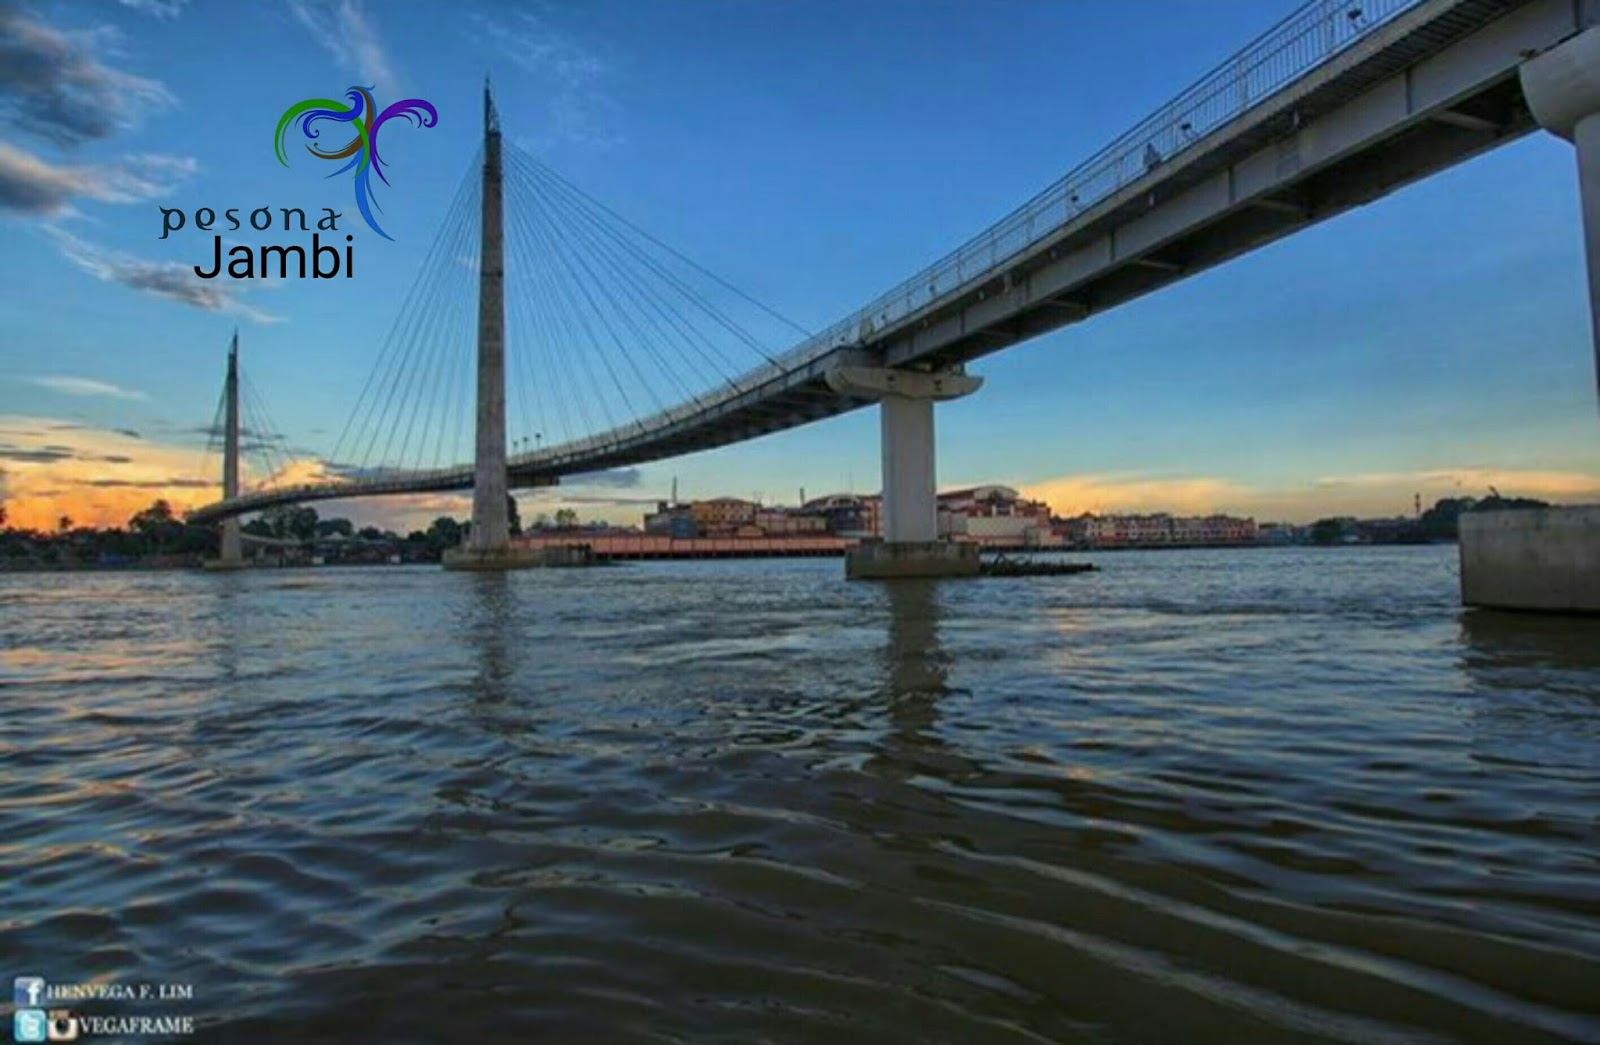 Pesona Jambi Jembatan Pedestrian Gentala Arasy Kota